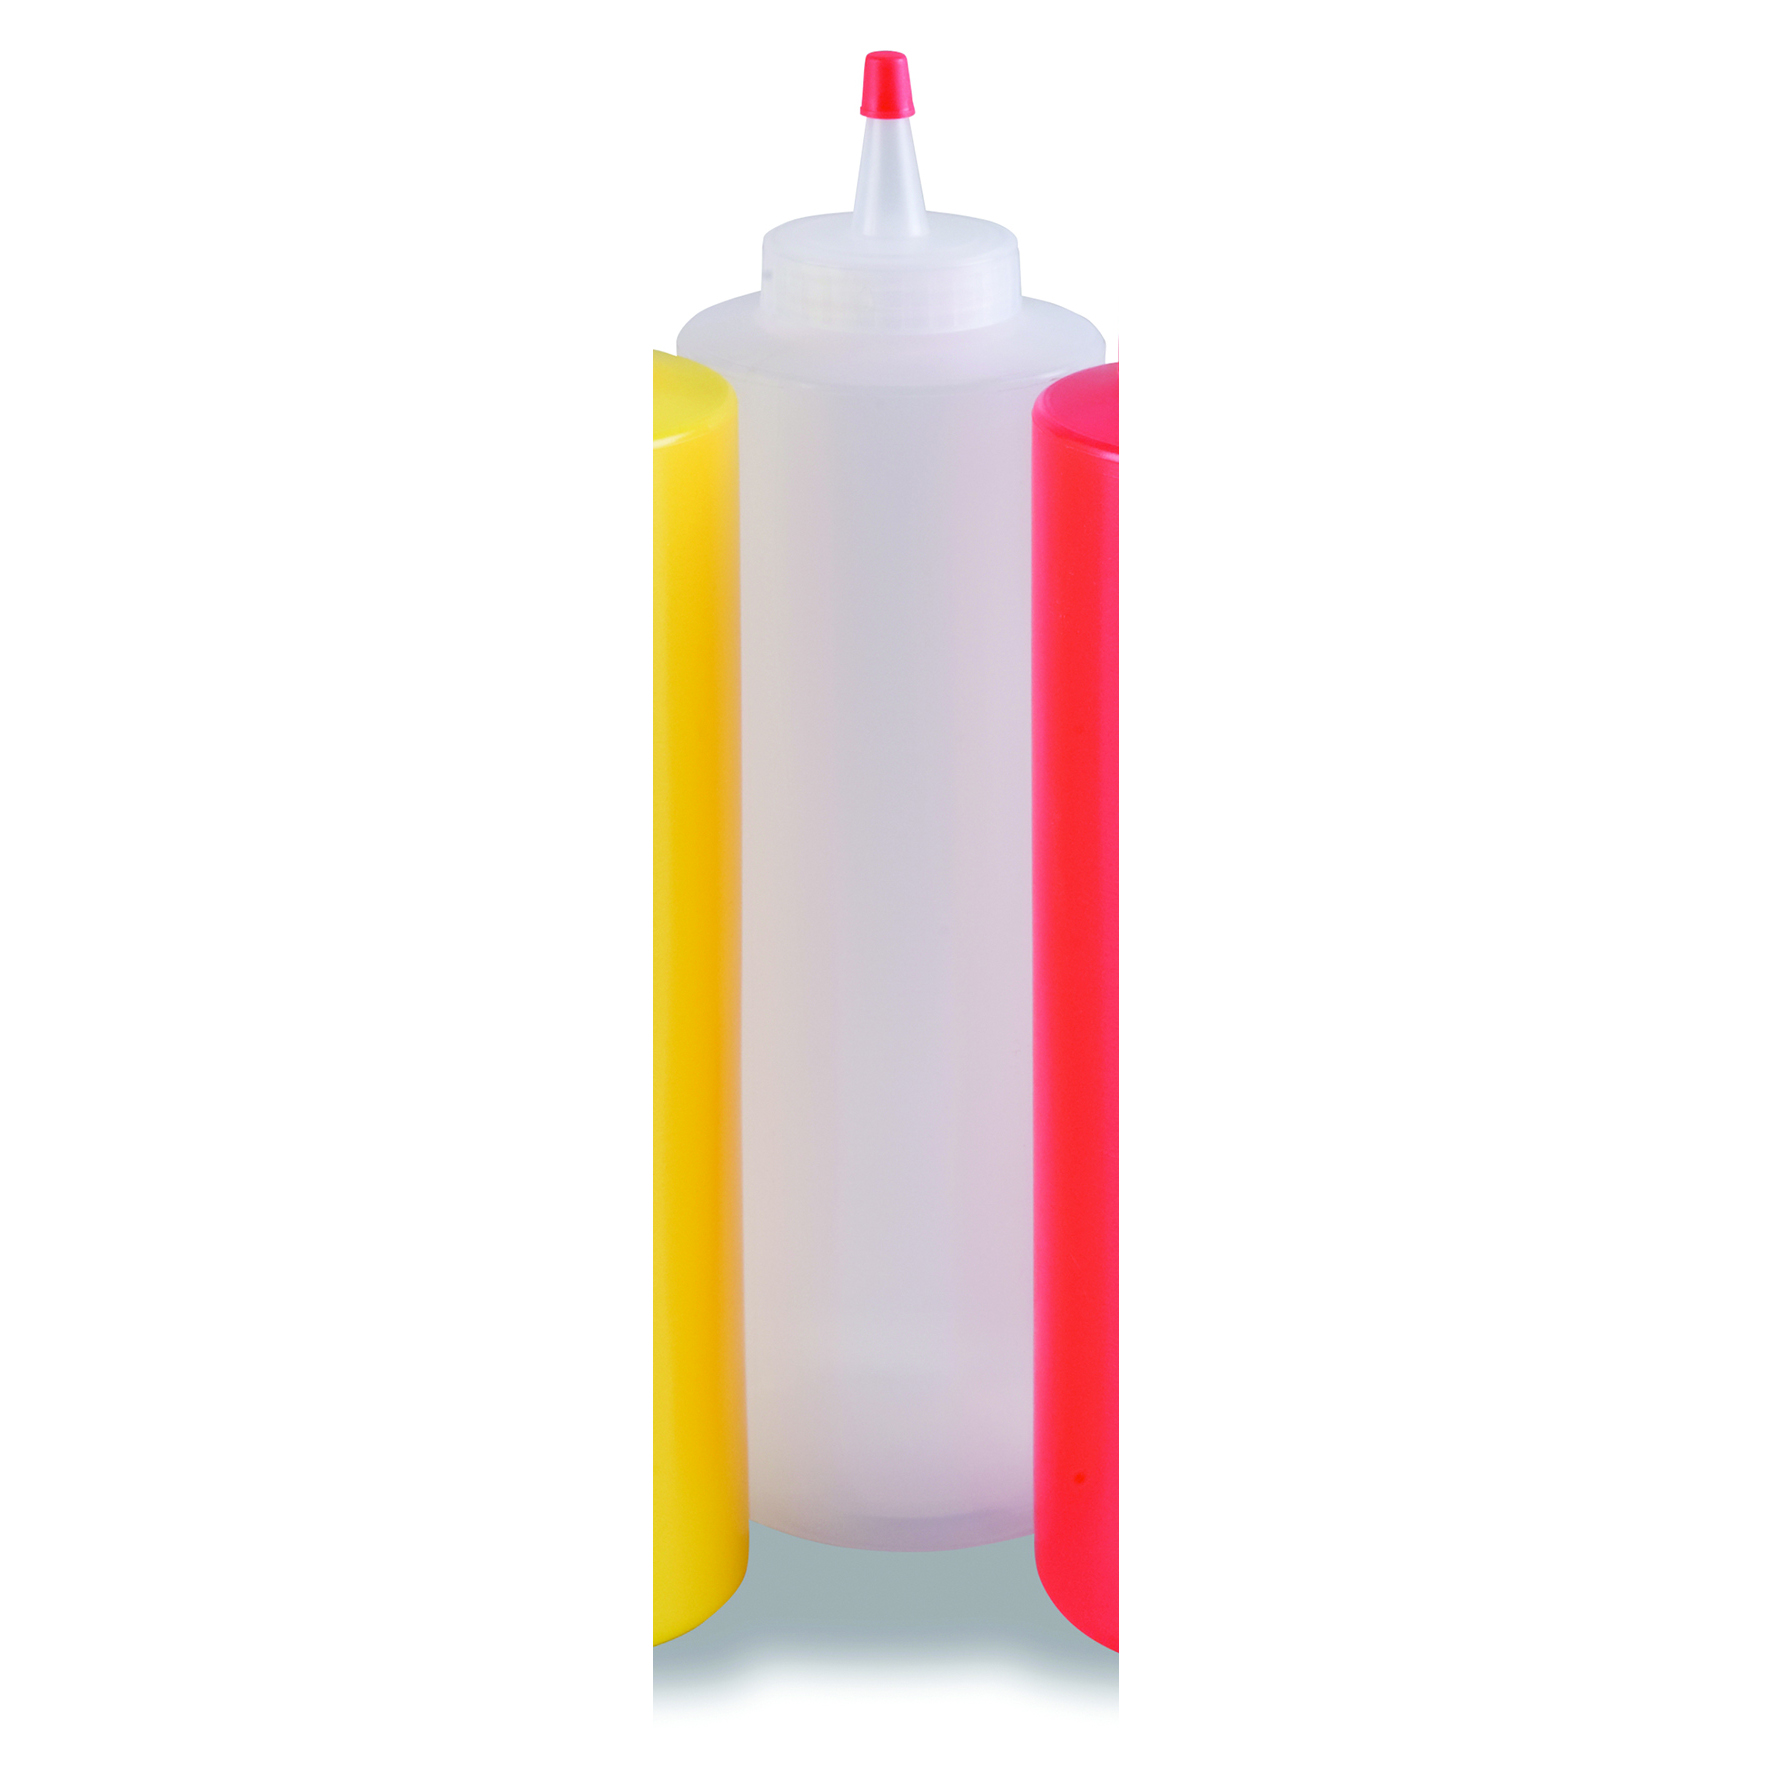 BOTELLA DE PLASTICO - BIBERON TRANSPARENTE 75 CL